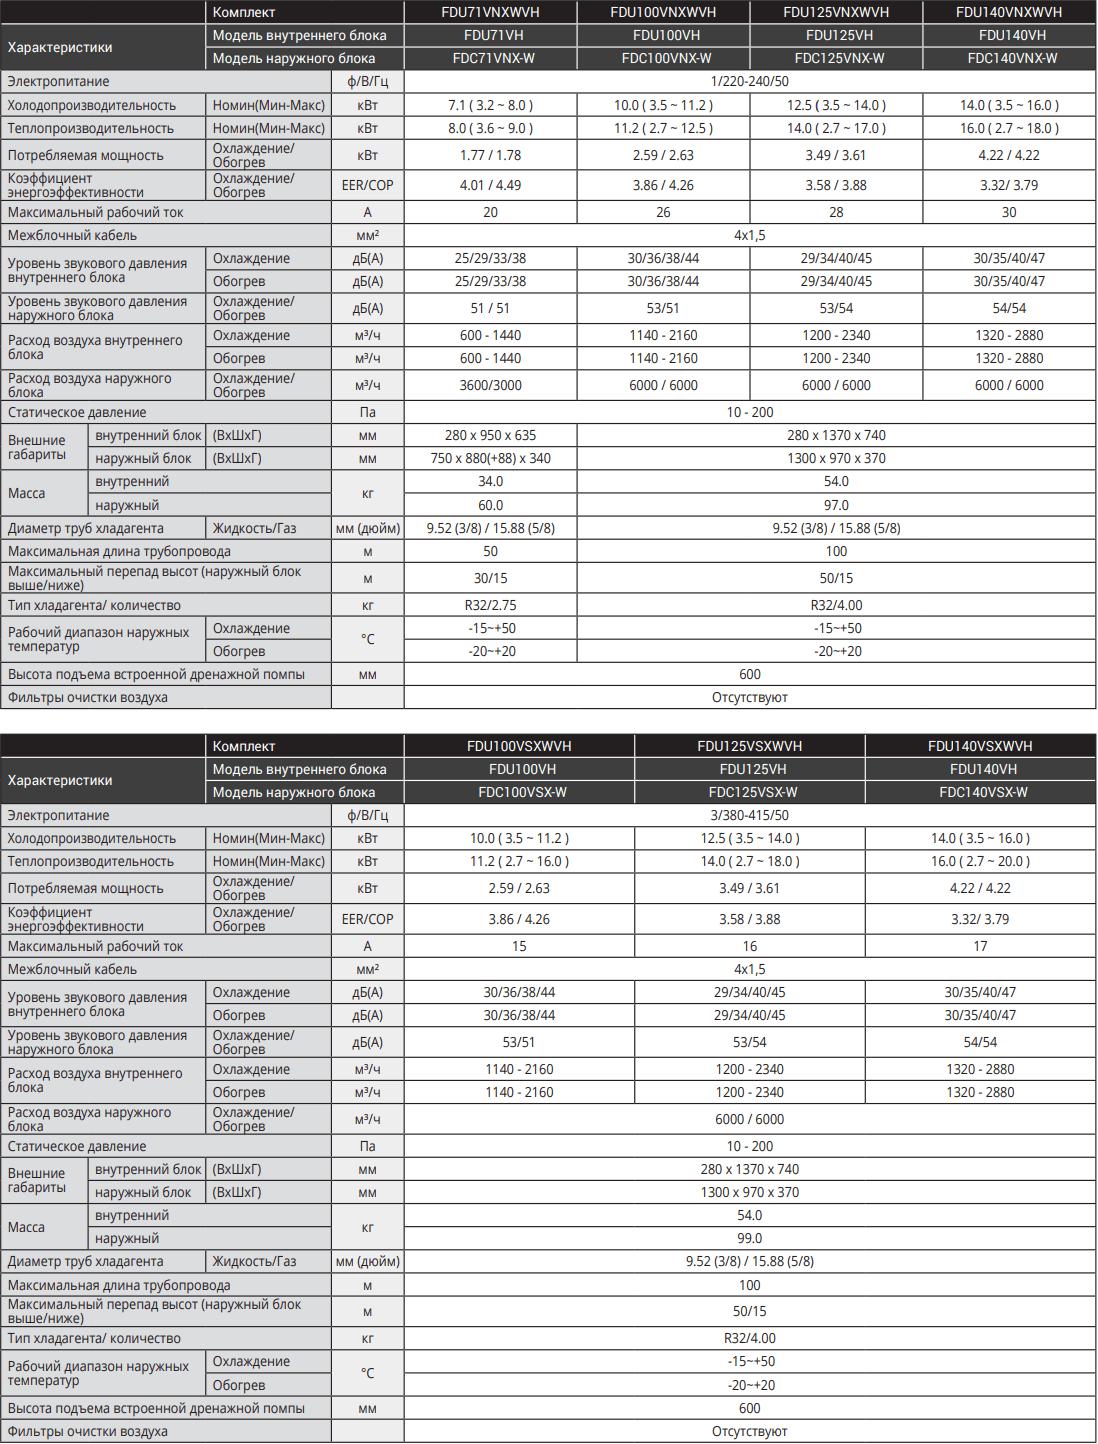 Канальный кондиционер Mitsubishi Heavy Hyper Inverter FDU-VH - Характеристики